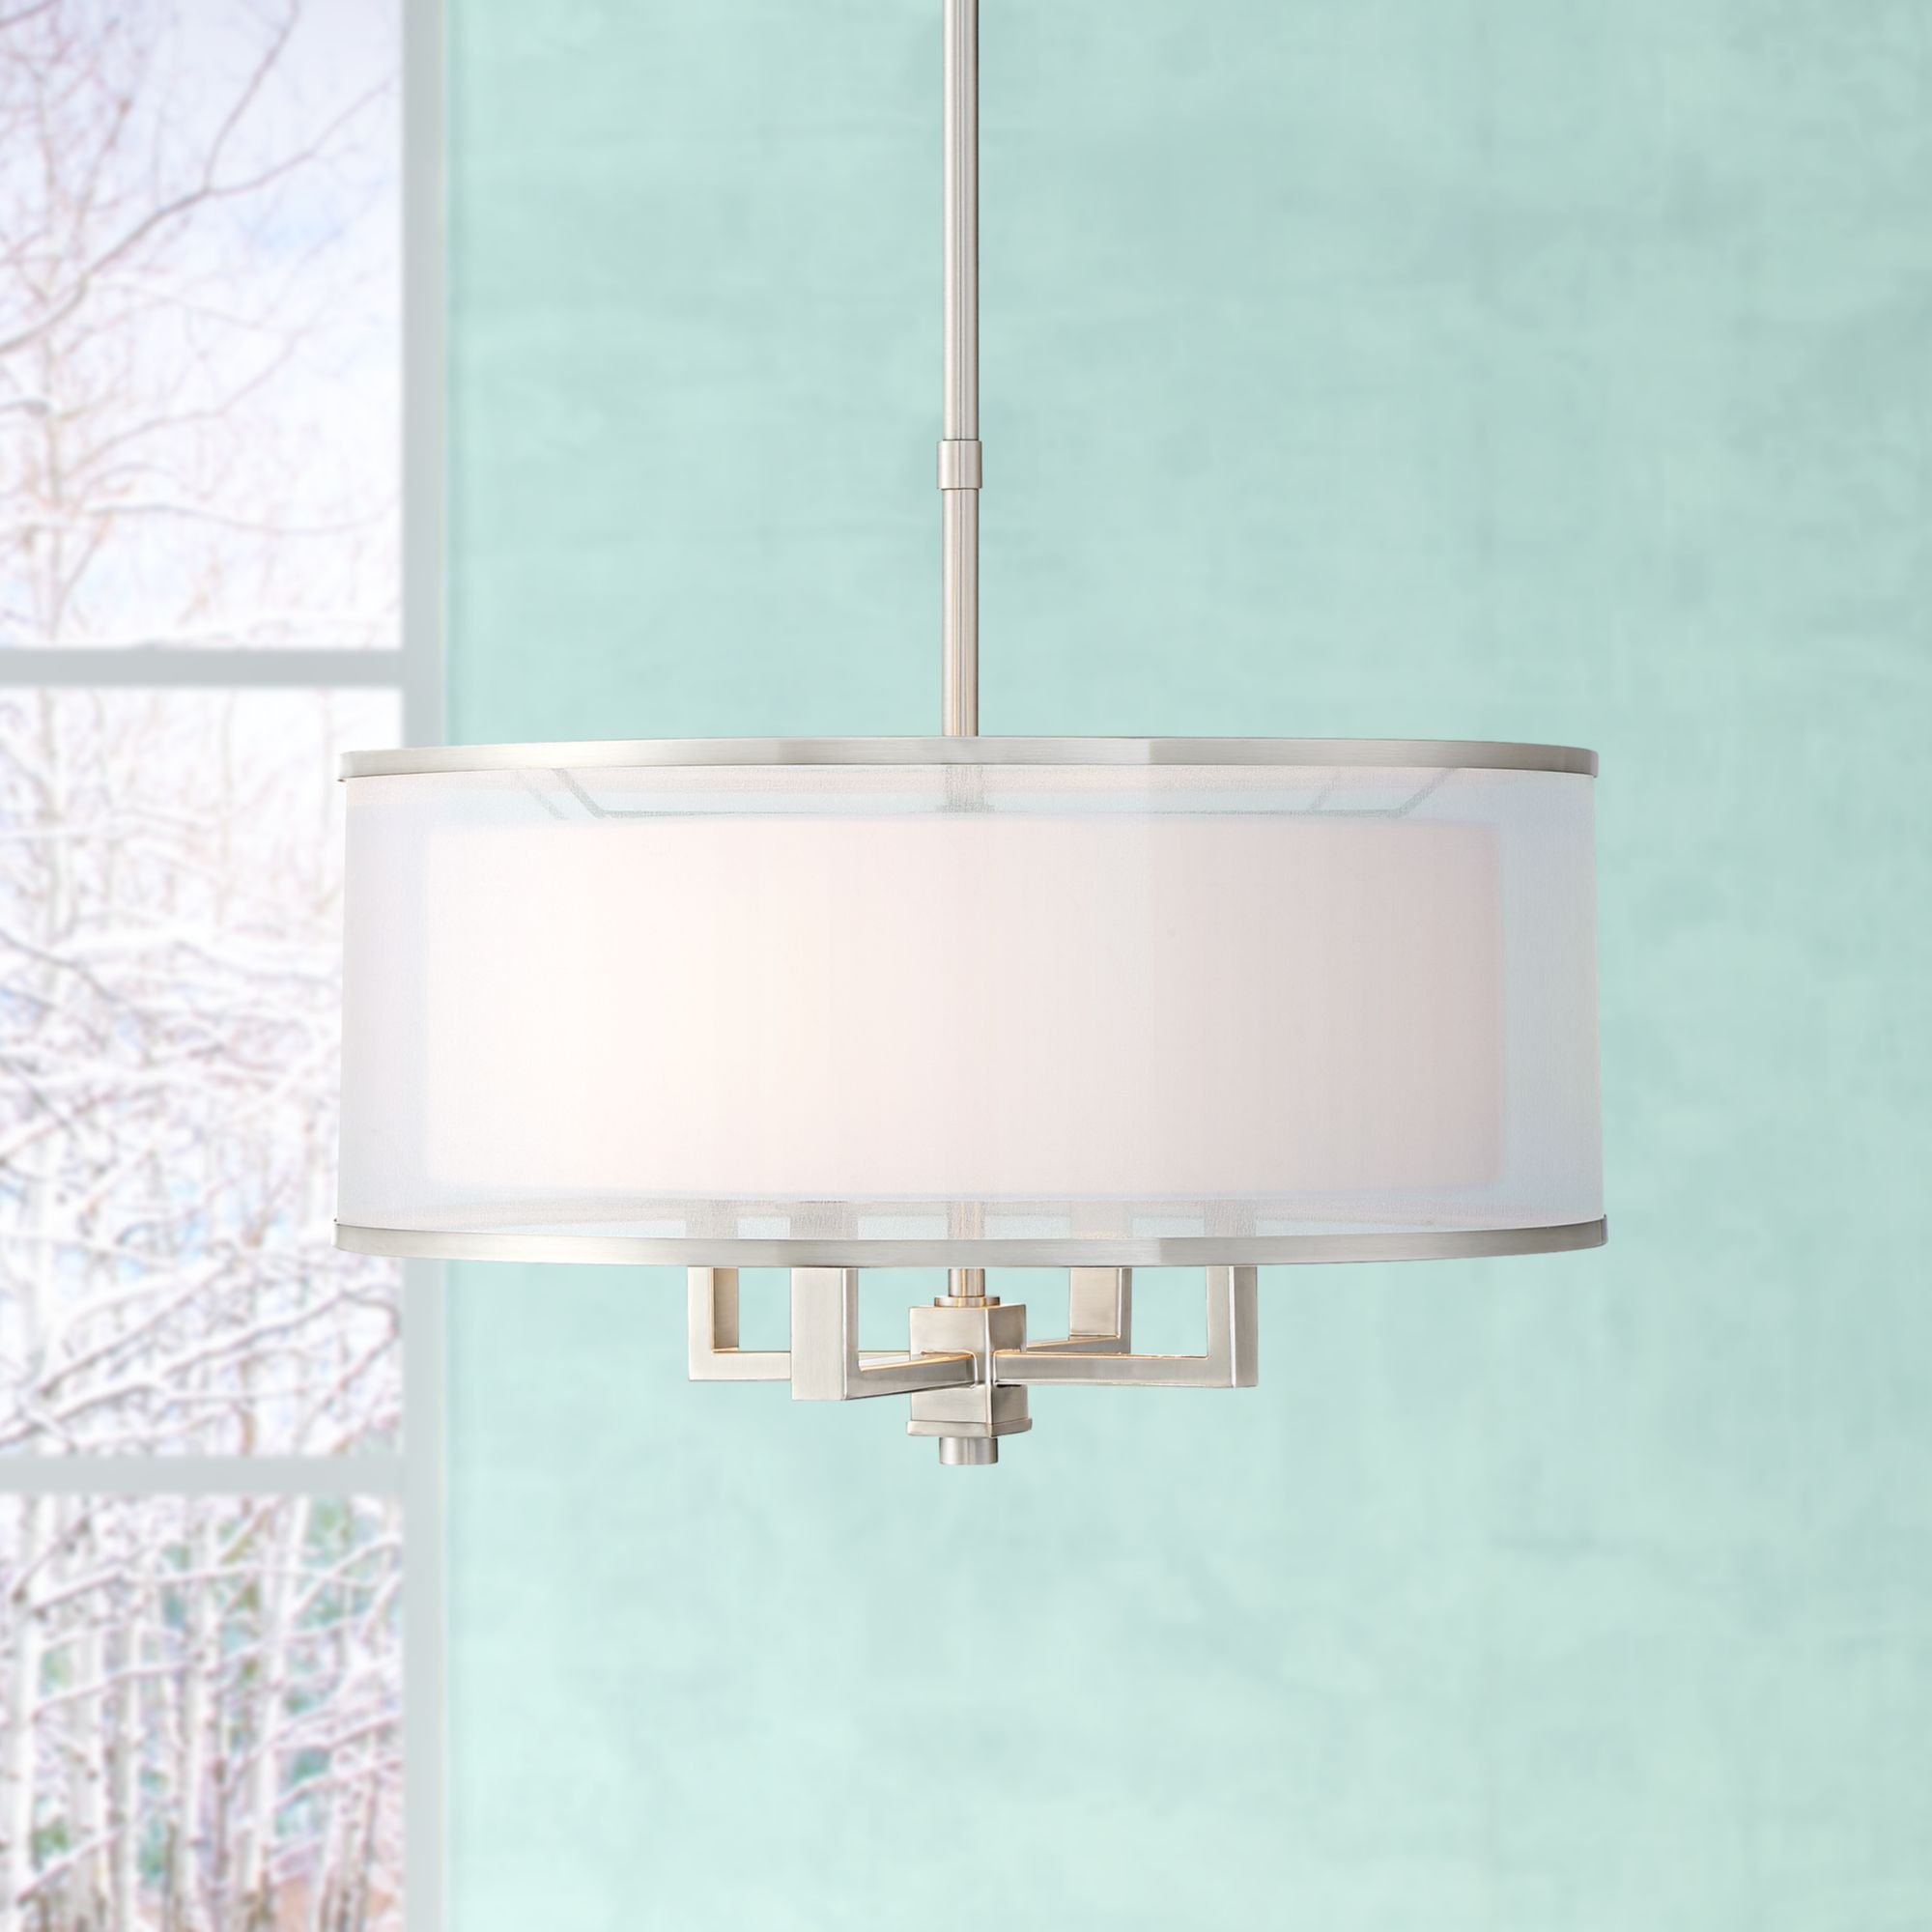 Image of: Possini Euro Design Brushed Nickel Drum Pendant Chandelier 21 Wide Silver Organza White Shade 4 Light Fixture For Dining Room Walmart Com Walmart Com